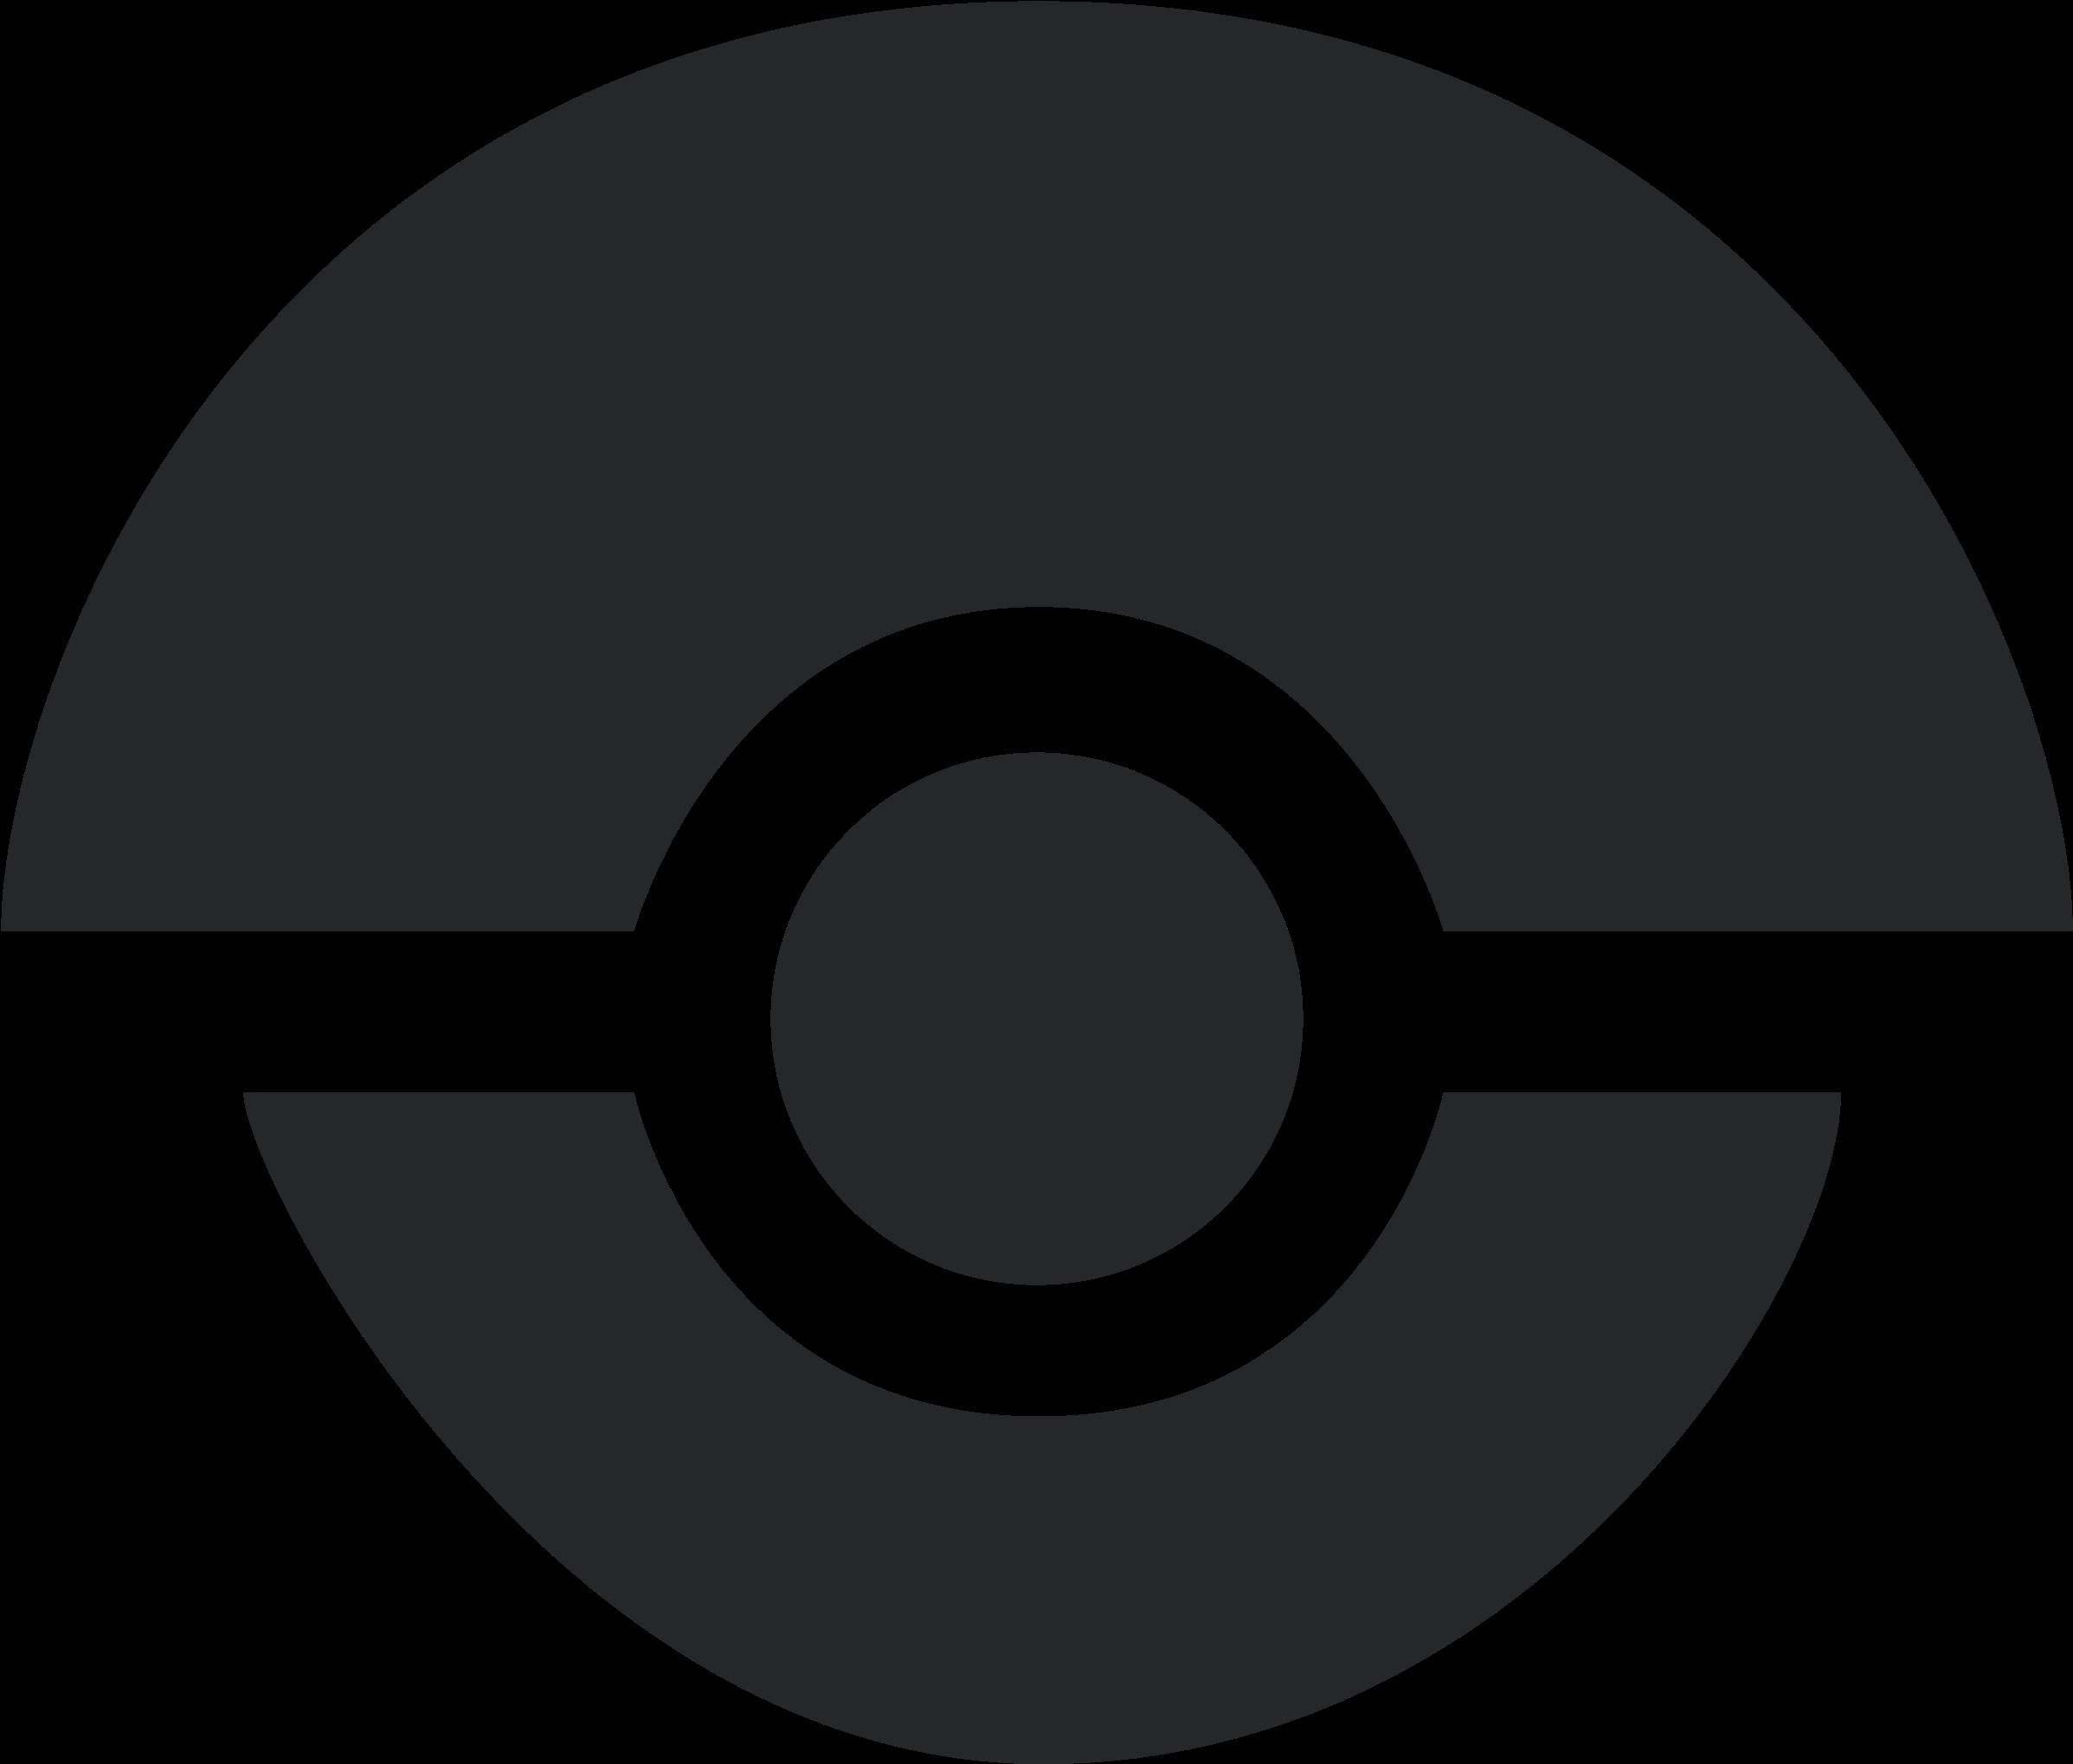 Download Drone Logo Png Transparent.